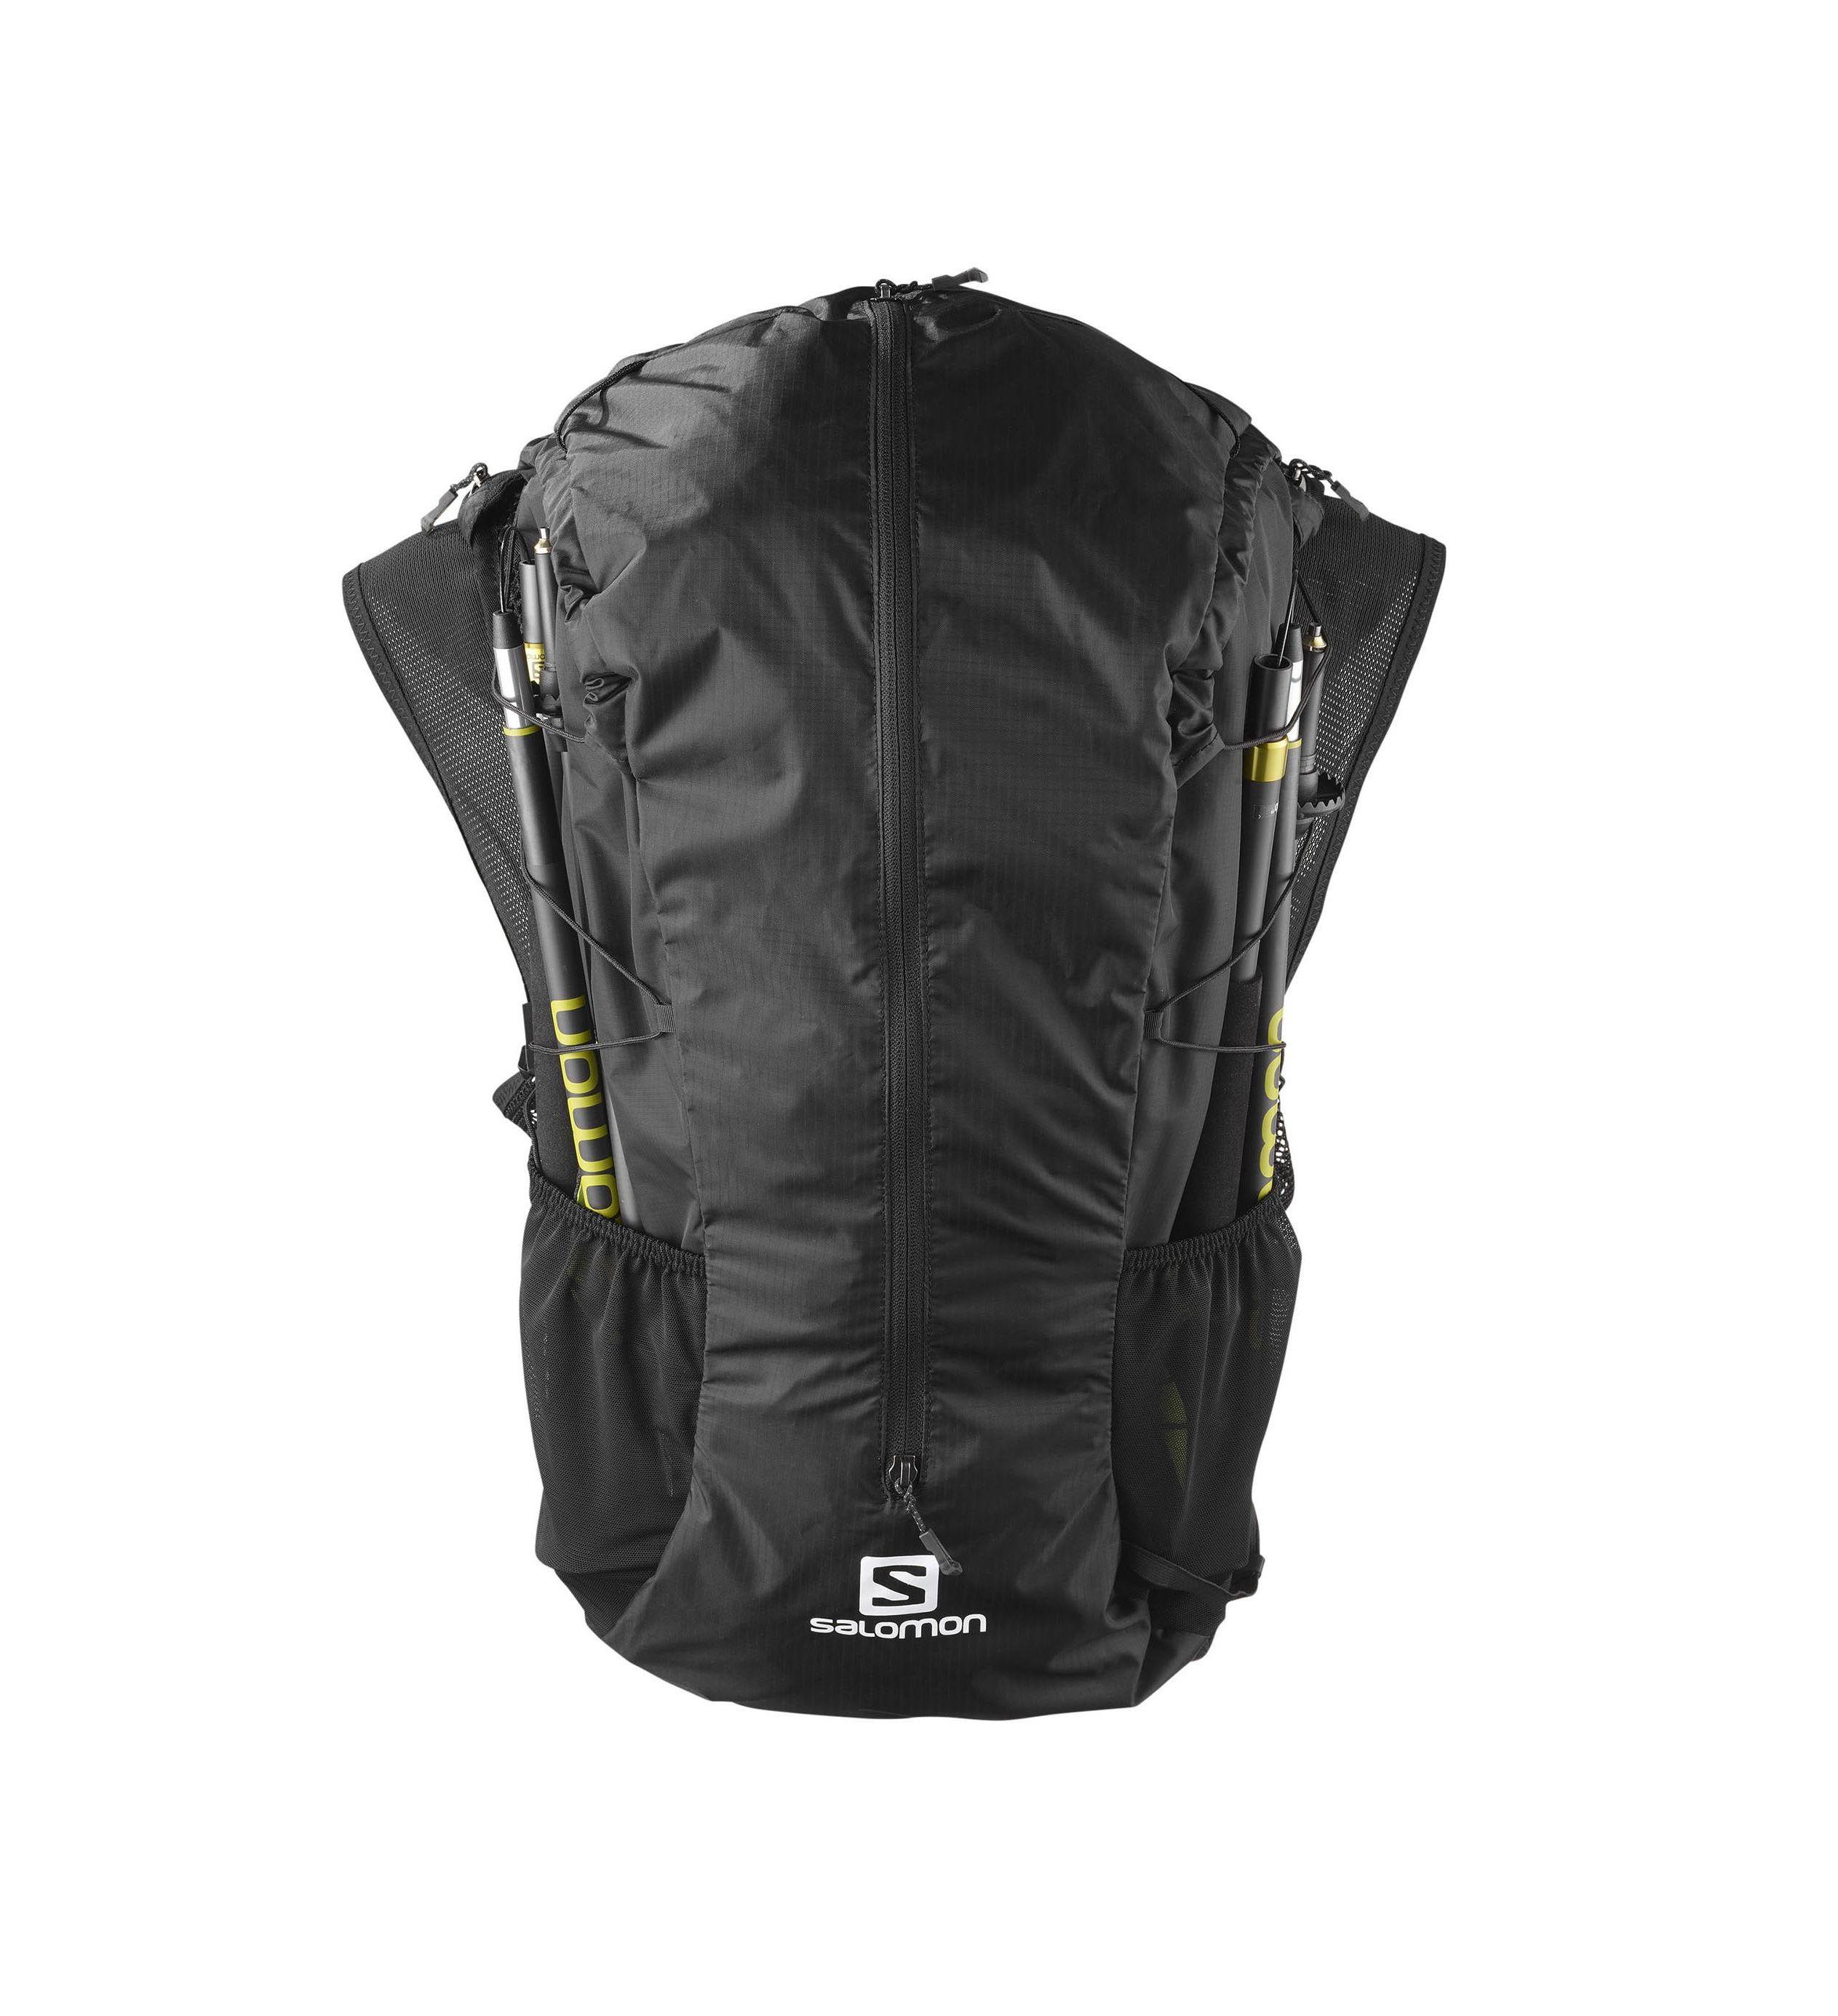 3294ed47566d Salomon Running Bag gym bag backpack